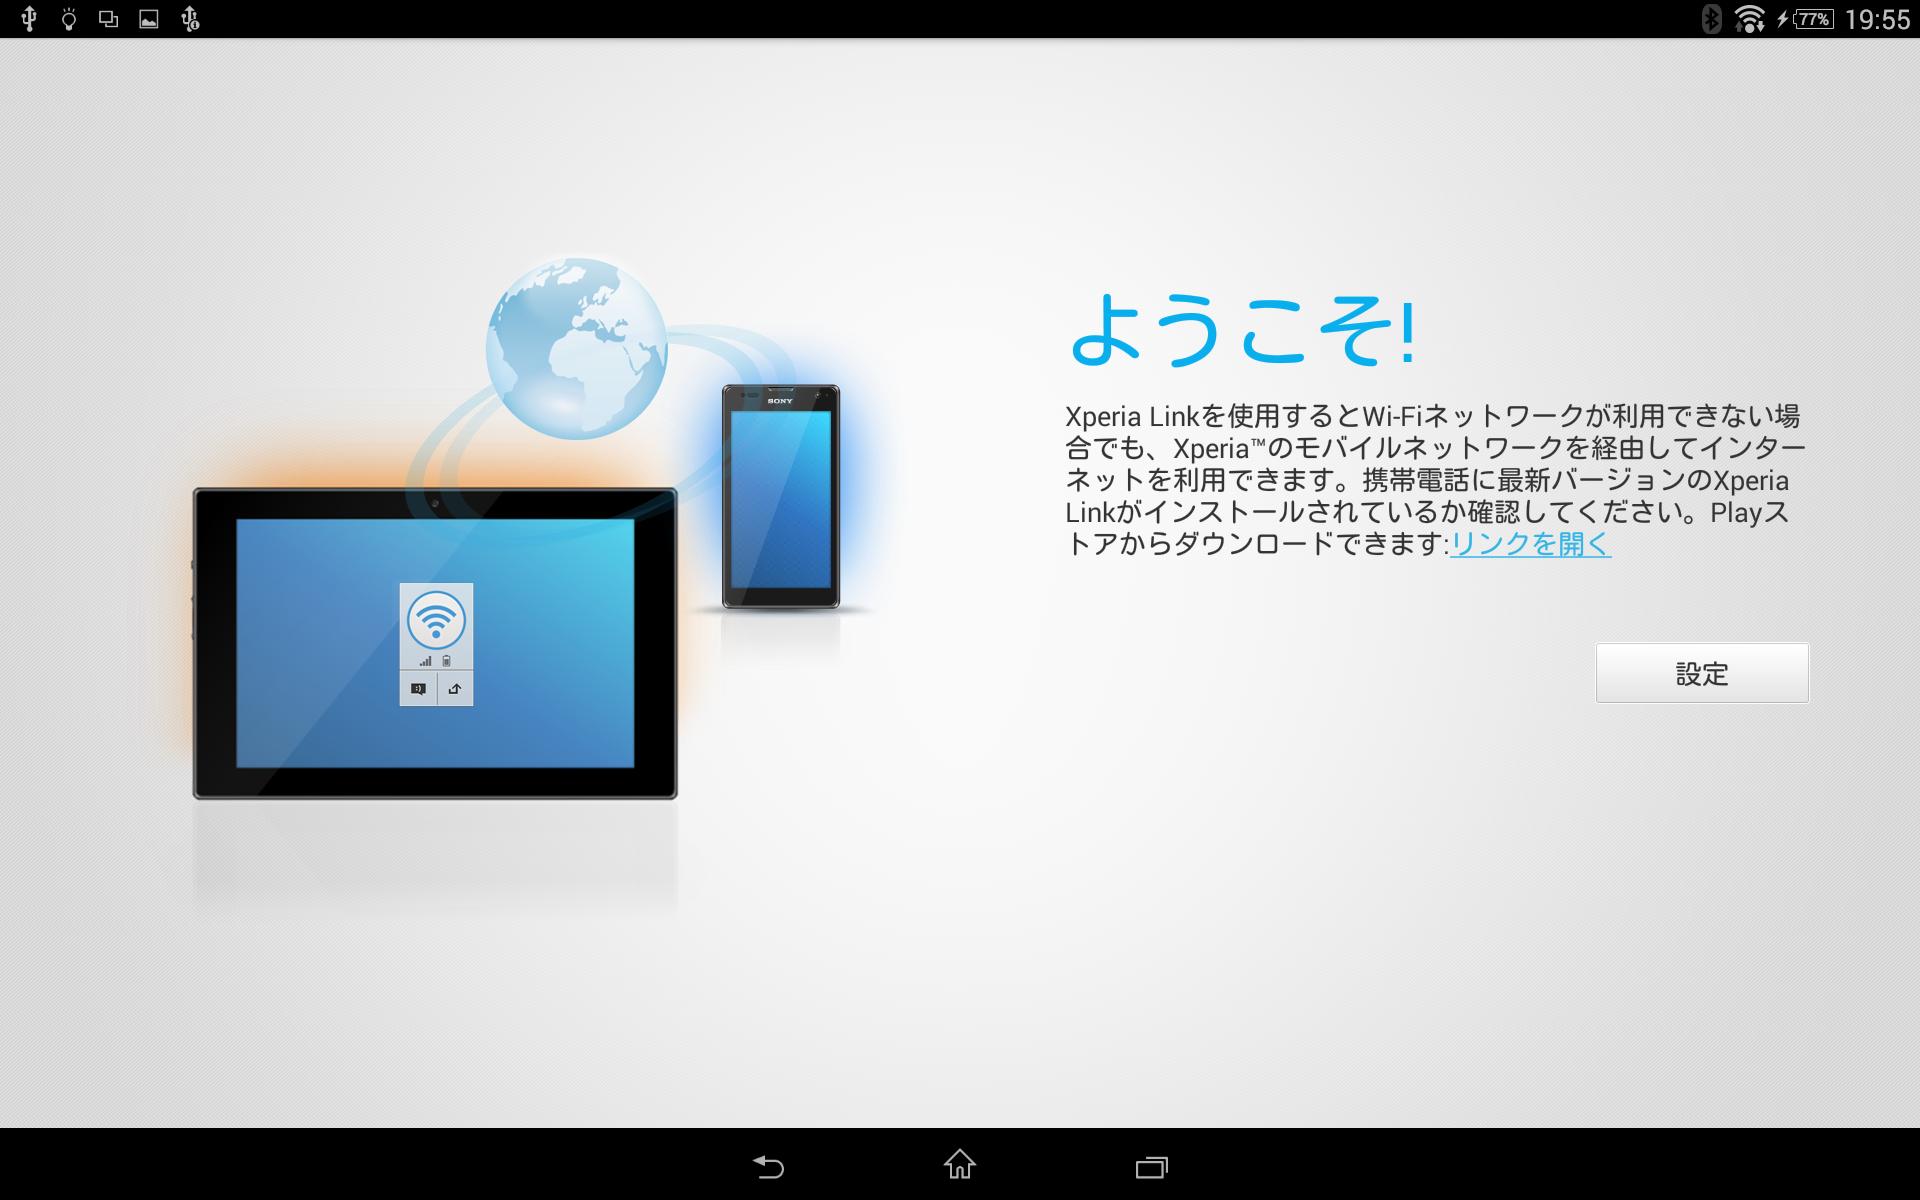 Xperia Link。Xperia同士の自動テザリング機能